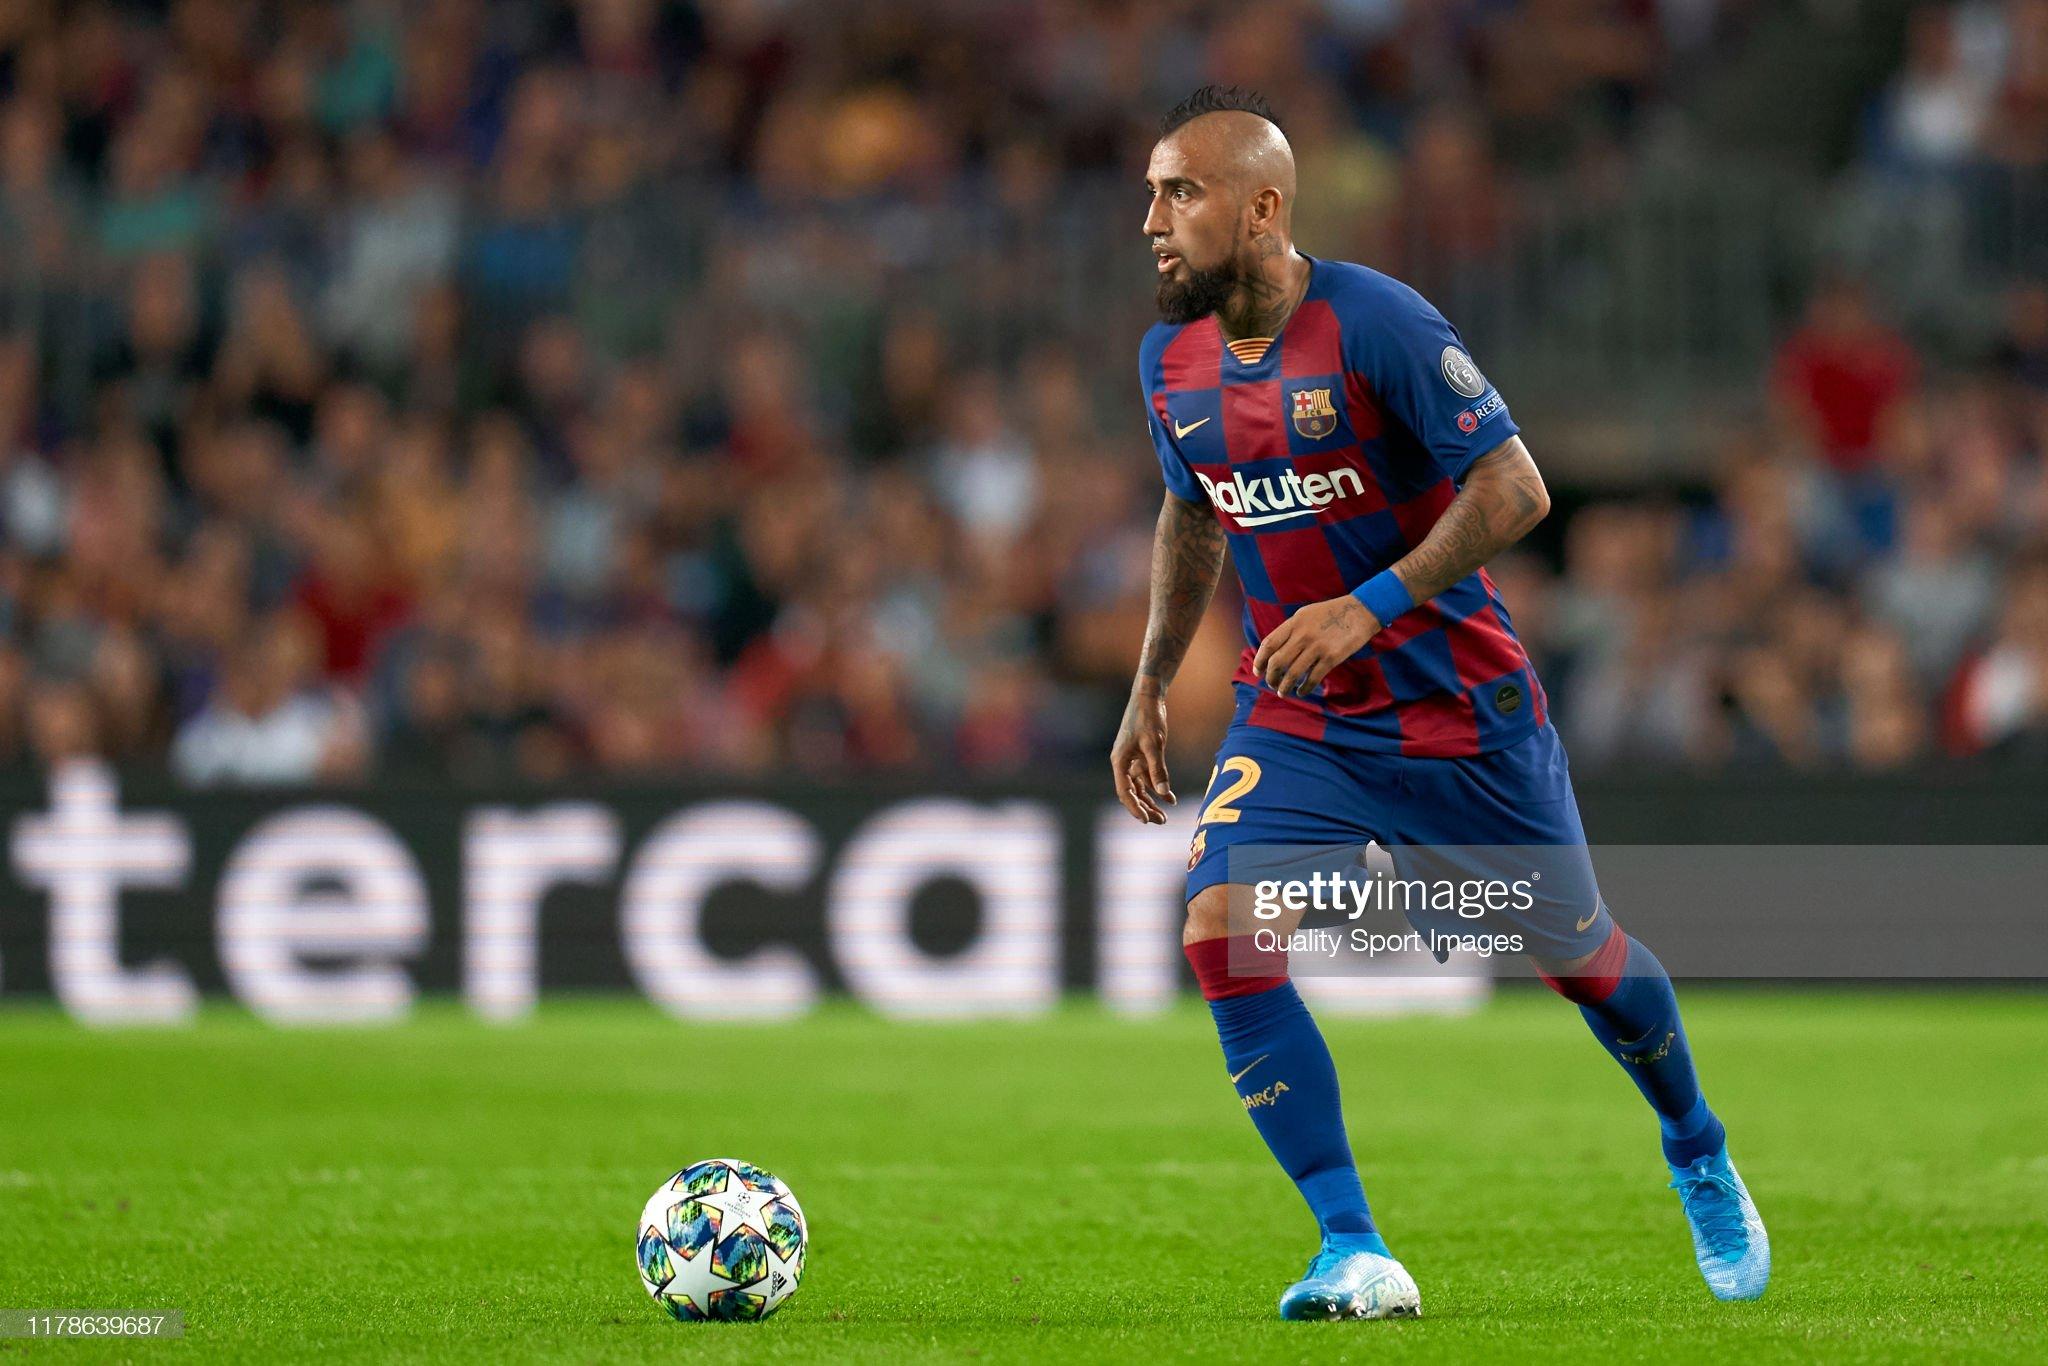 صور مباراة : برشلونة - إنتر 2-1 ( 02-10-2019 )  Arturo-vidal-of-fc-barcelona-with-the-ball-during-the-uefa-champions-picture-id1178639687?s=2048x2048